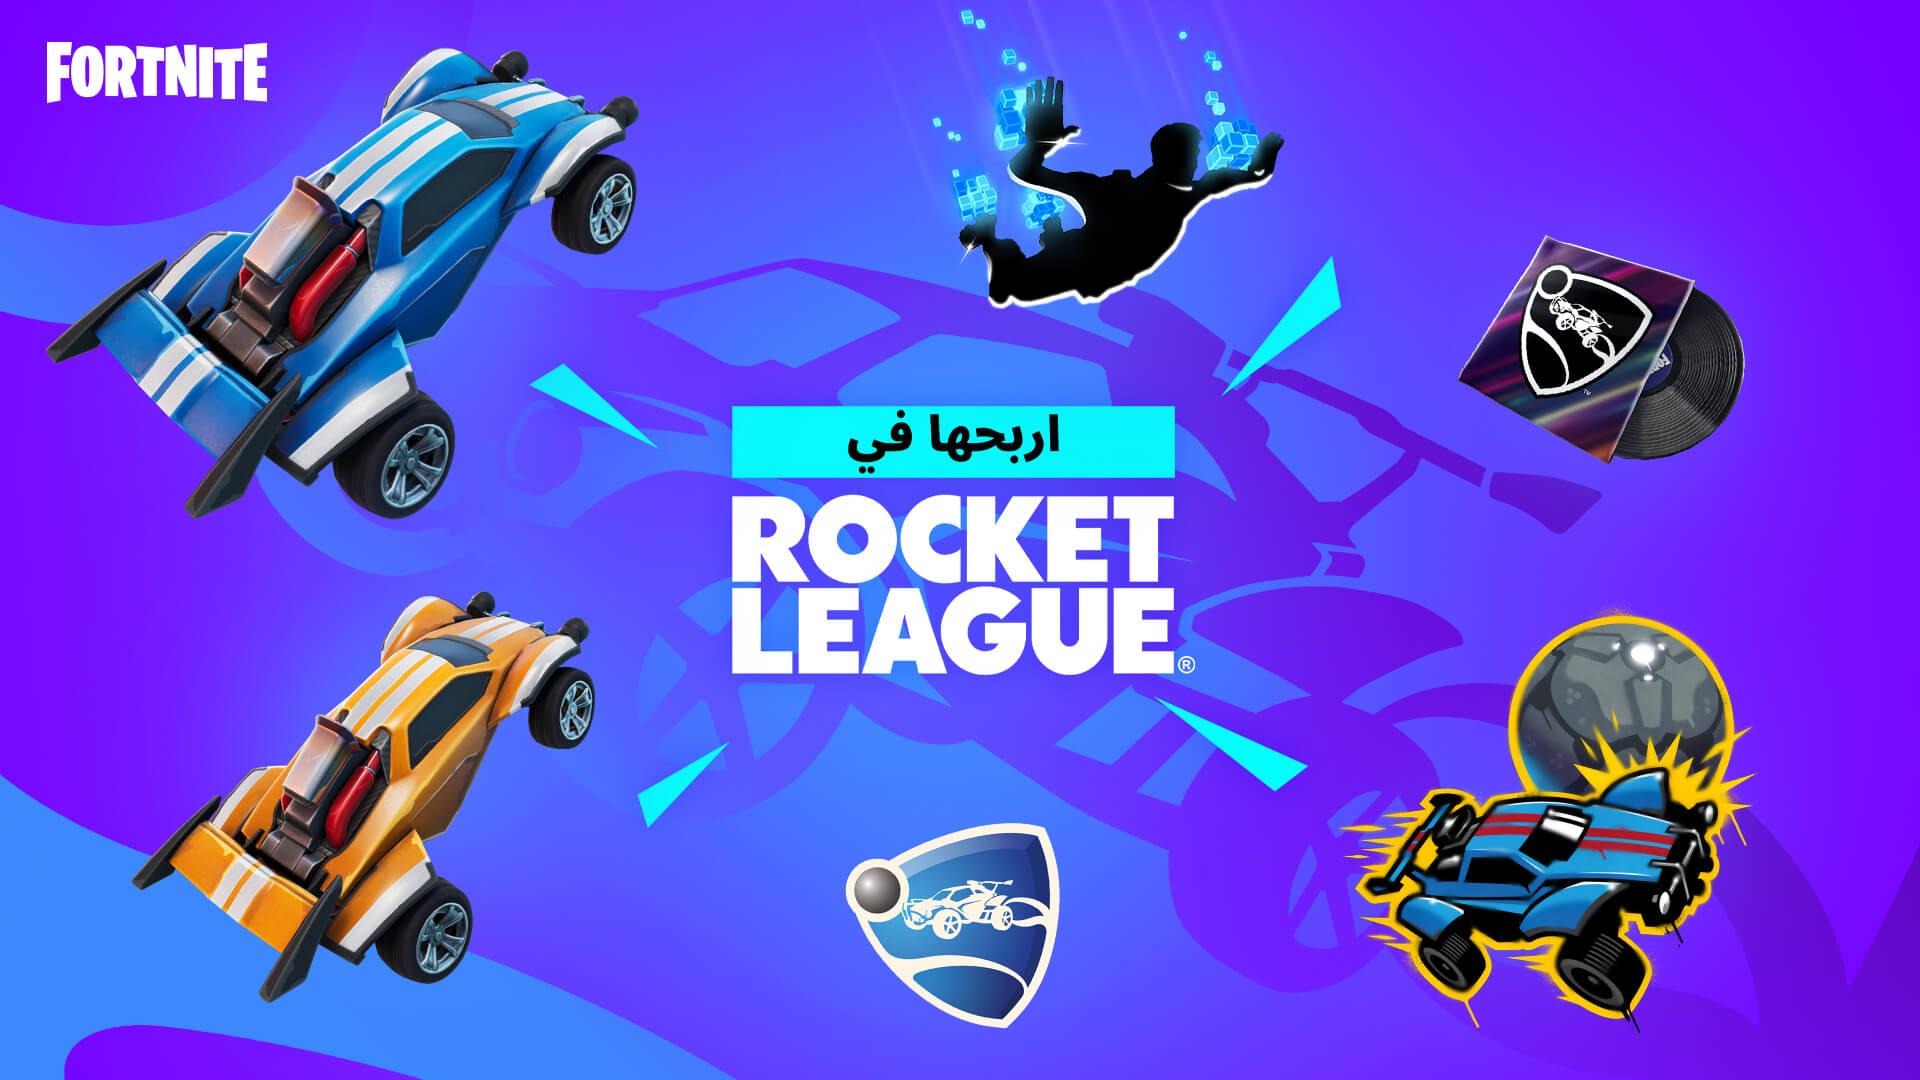 AR Rocket League Fortnite Challenges And Rewards